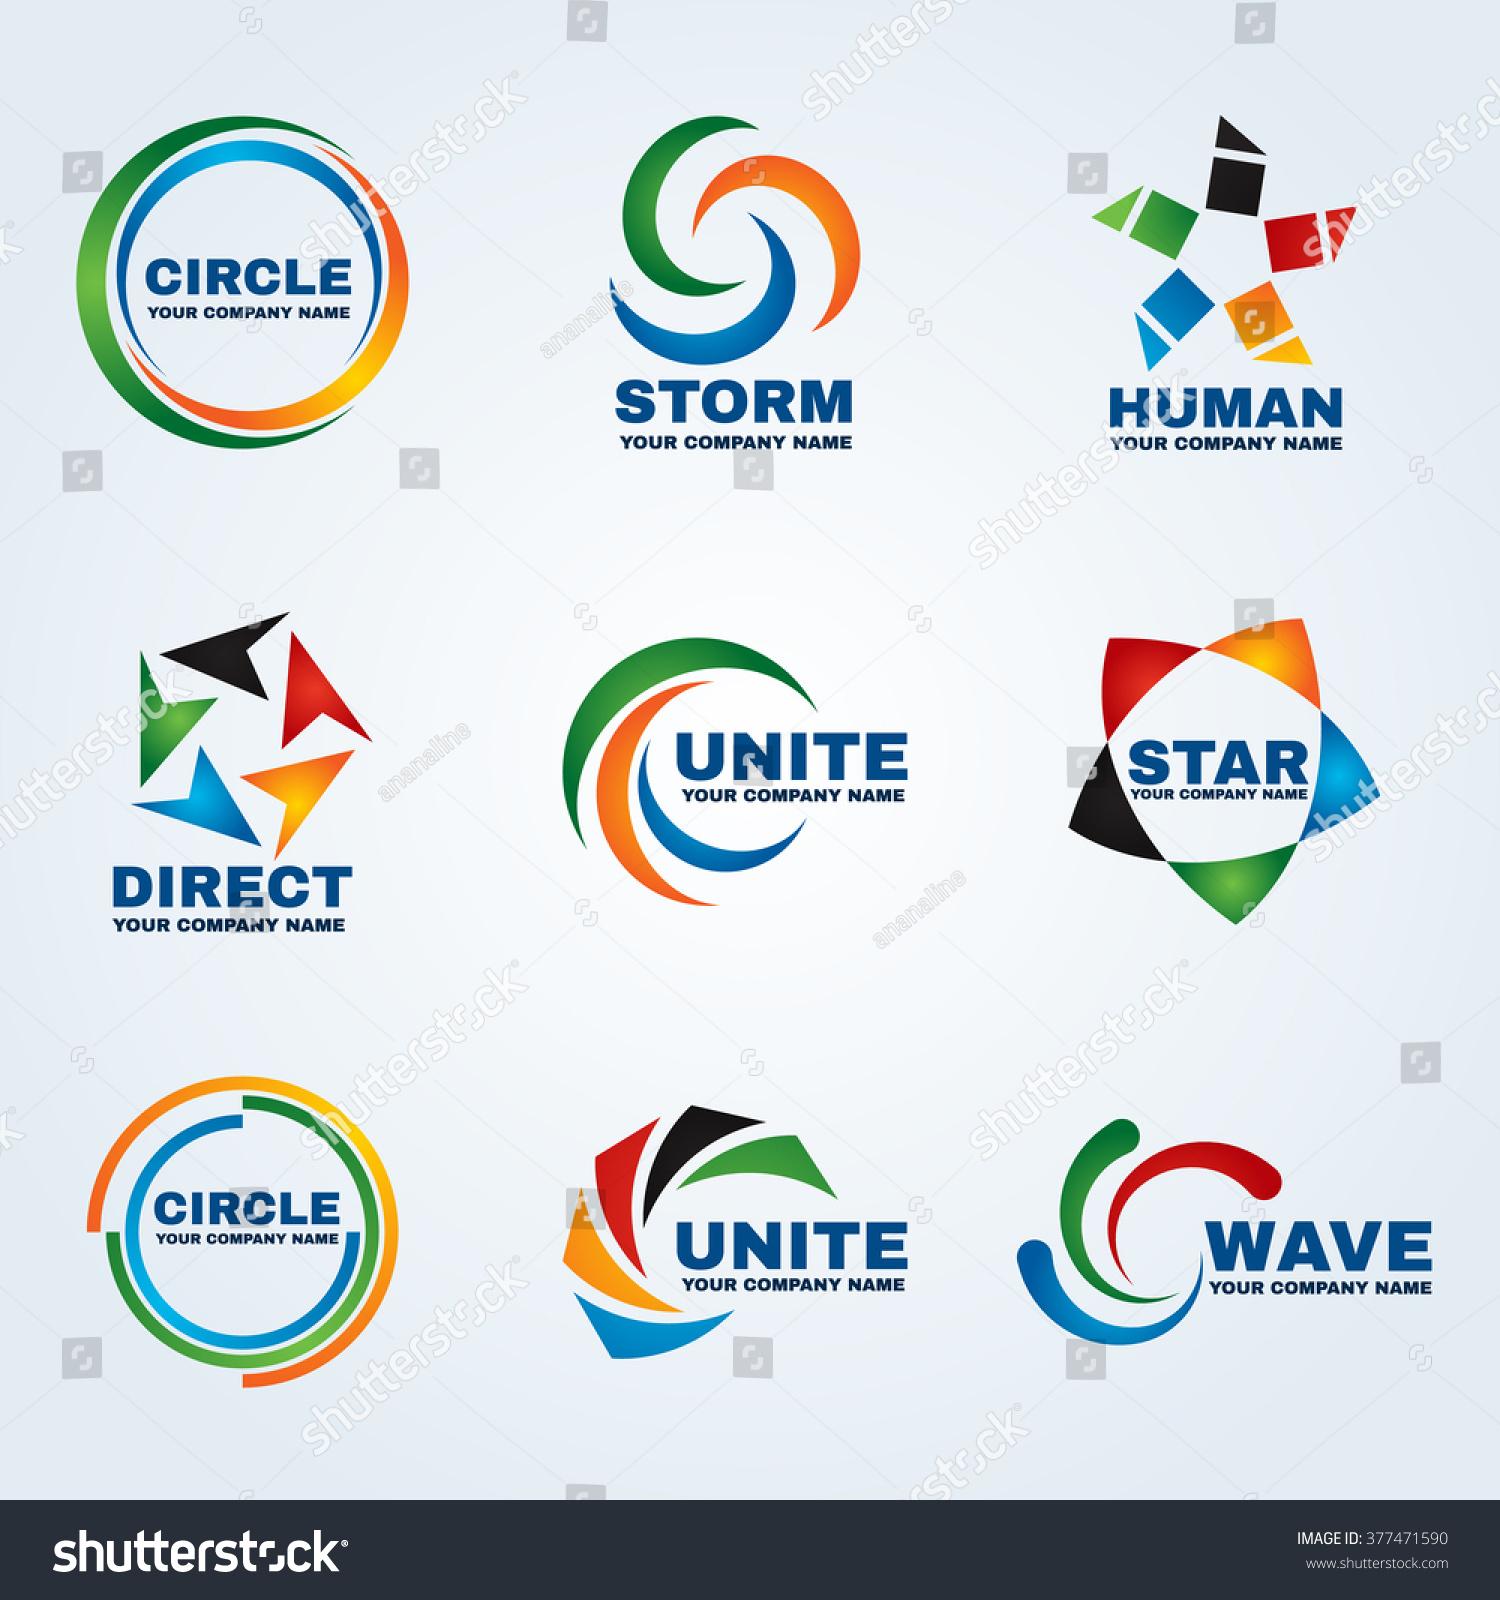 Vector graphic design business logo - Circle Logo Vector Art Design For Business